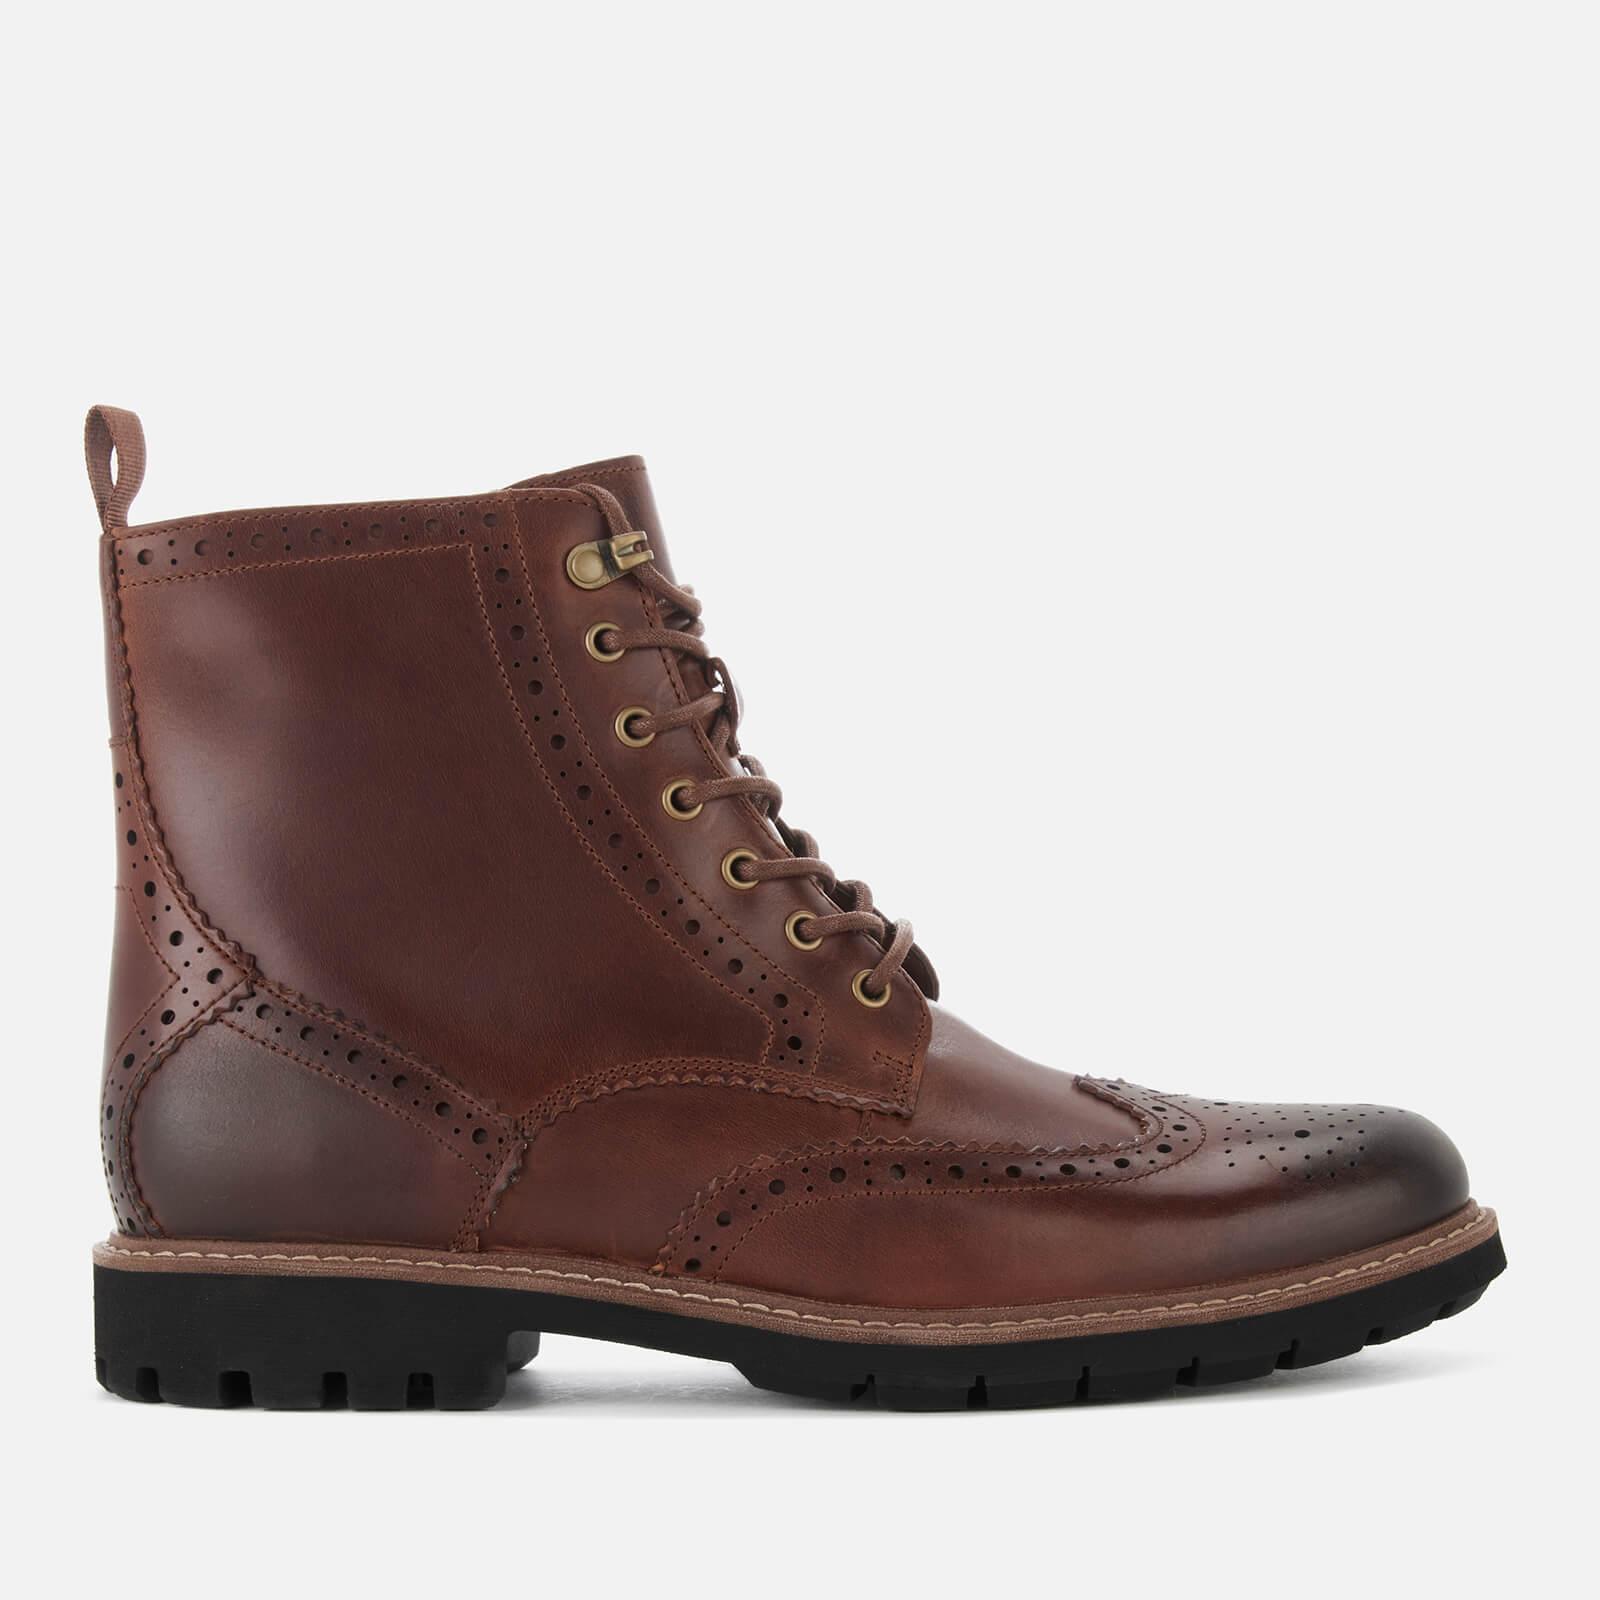 f49e5759 Clarks Men's Batcombe Lord Leather Brogue Lace Up Boots - Dark Tan Mens  Footwear | TheHut.com